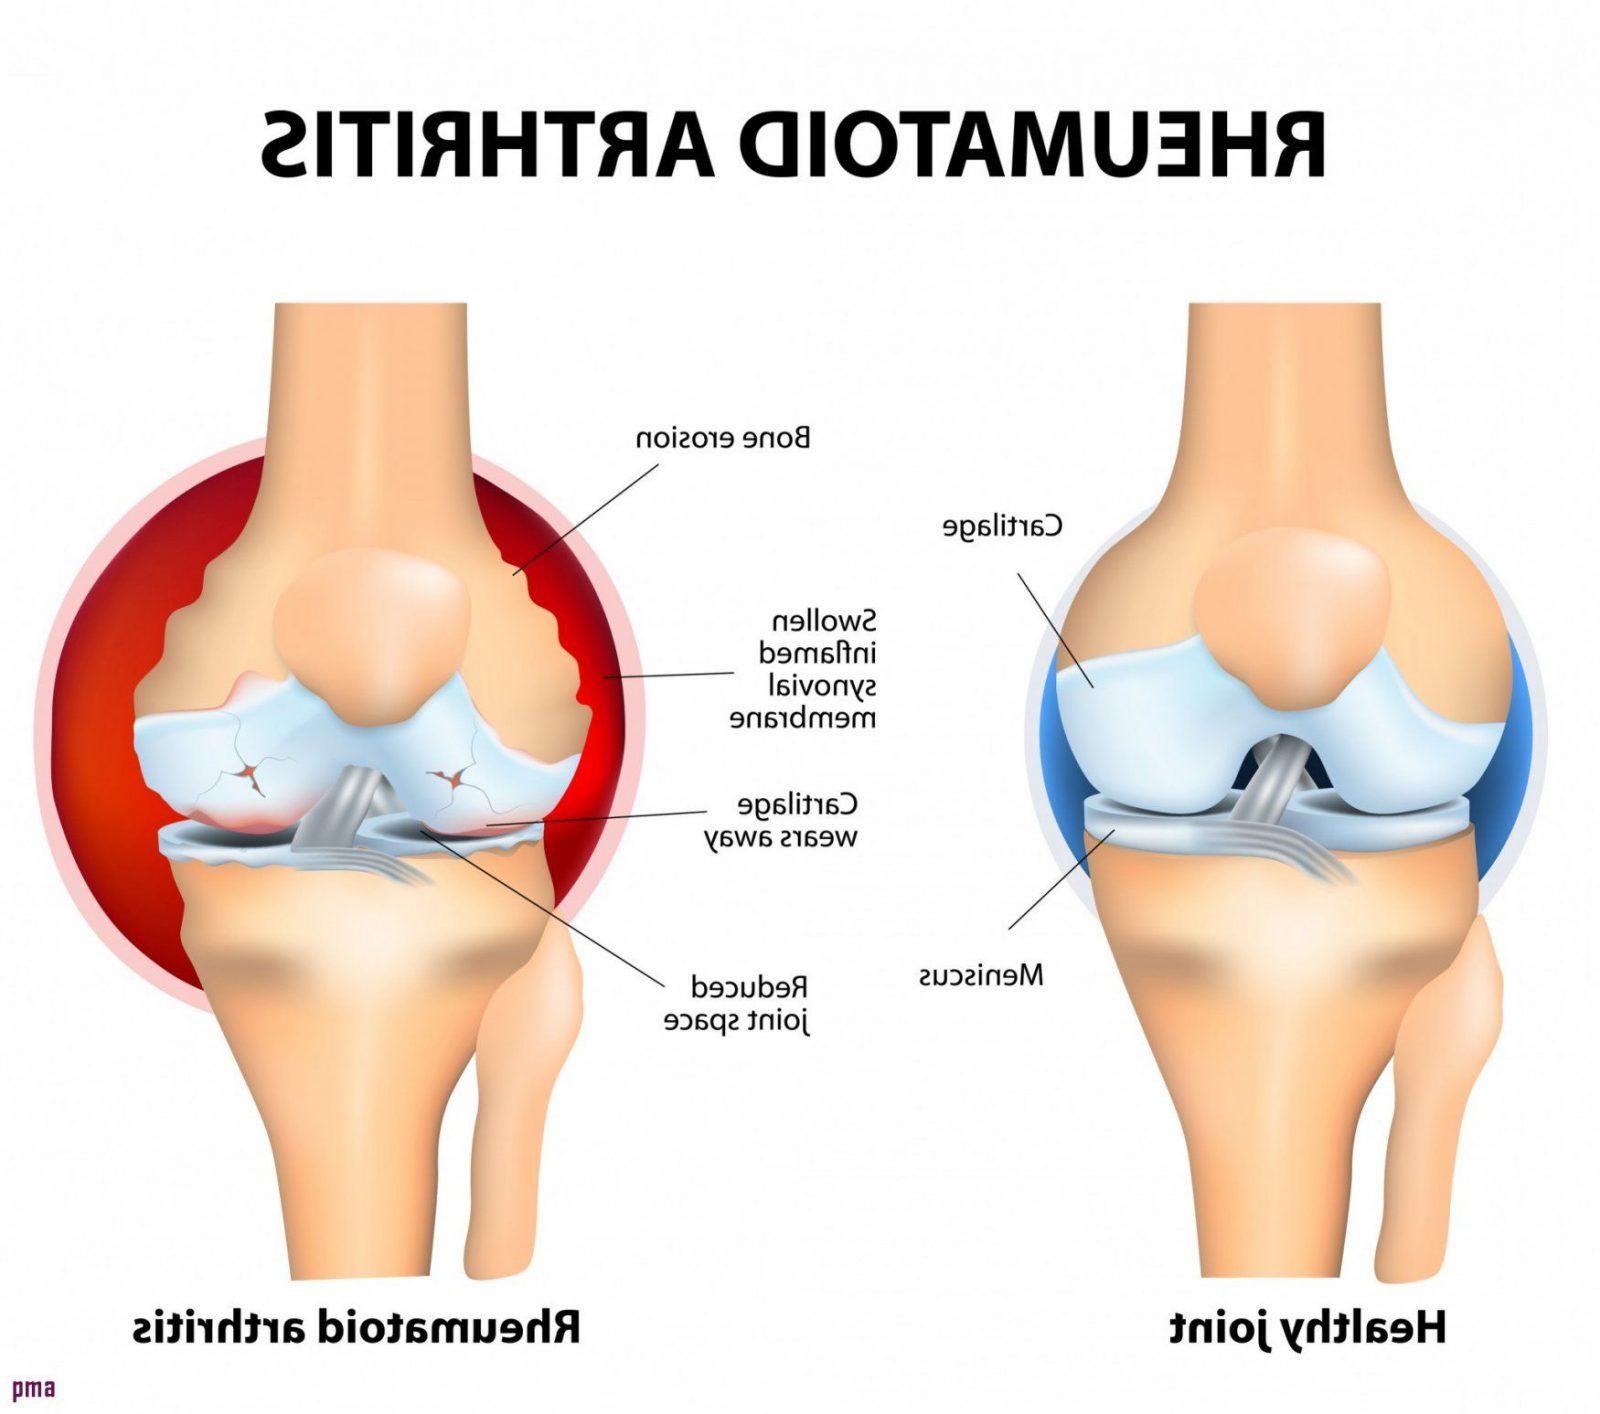 25 Top Layout Betreffend Knieschmerzen Beim Treppen Runtergehen von Knieschmerzen Beim Treppe Runter Bild